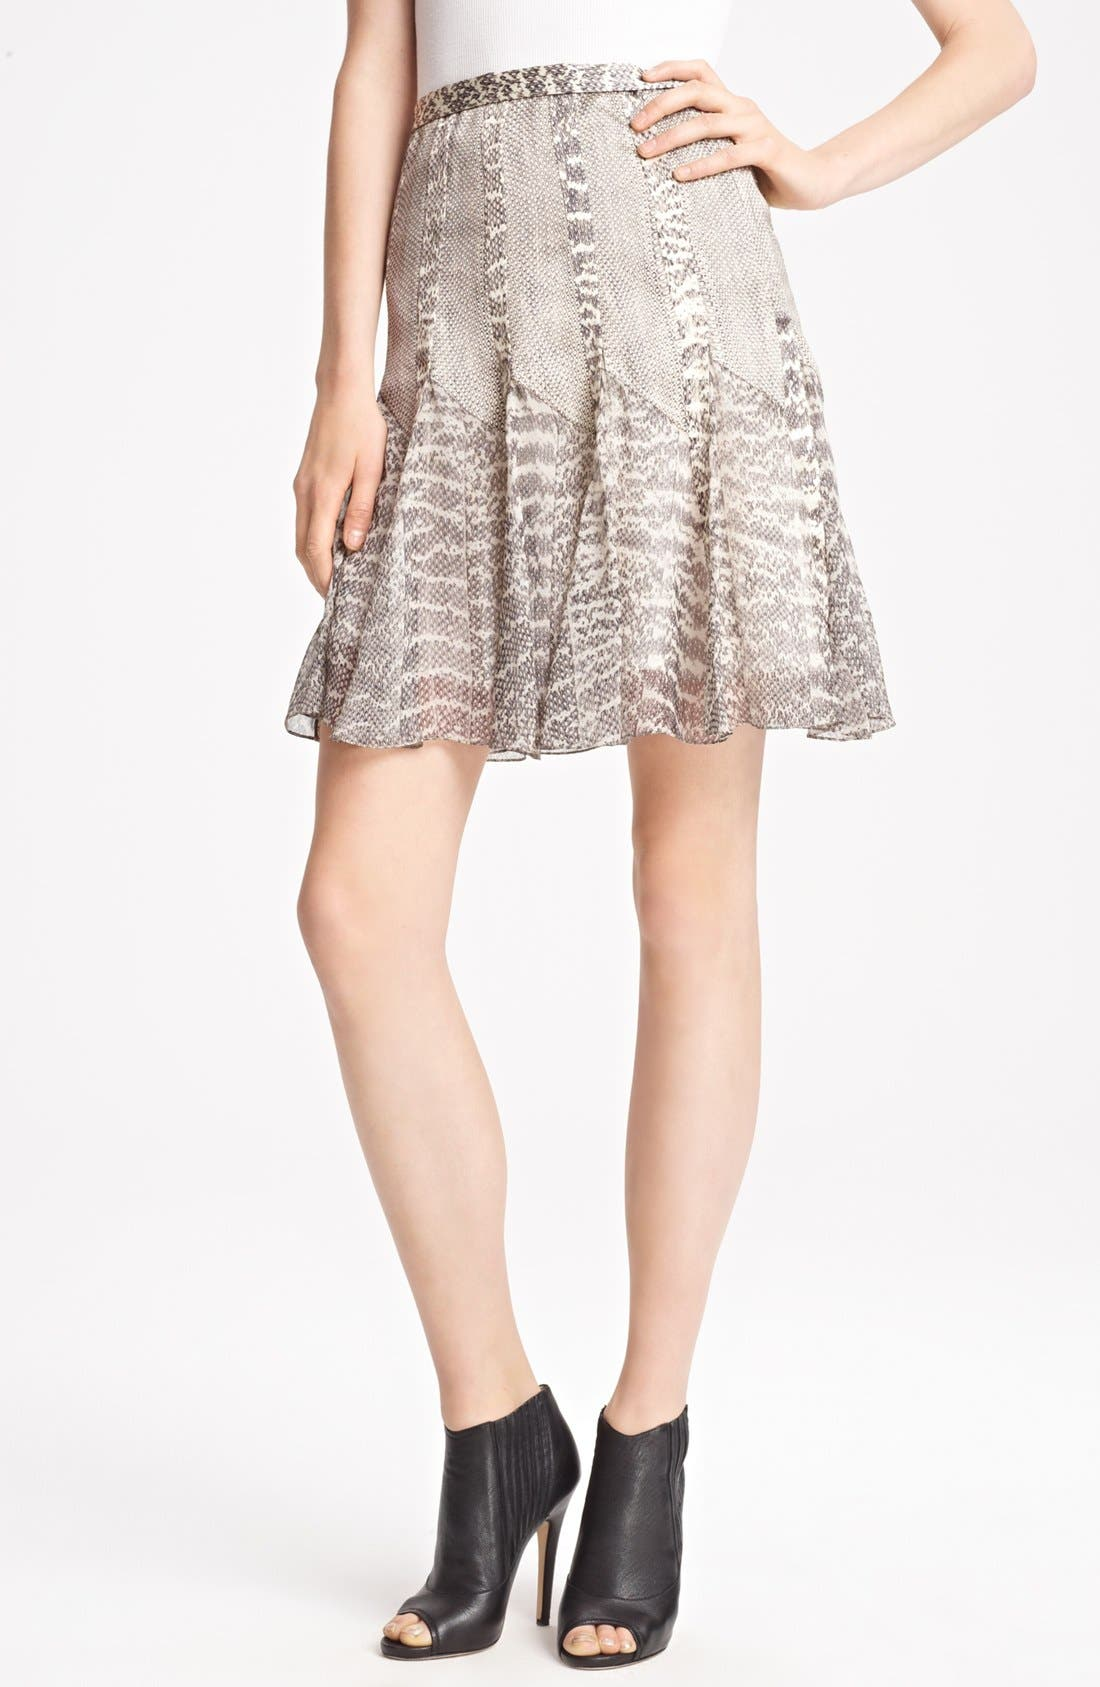 Alternate Image 1 Selected - Jason Wu Snakeskin Print Satin & Chiffon Skirt